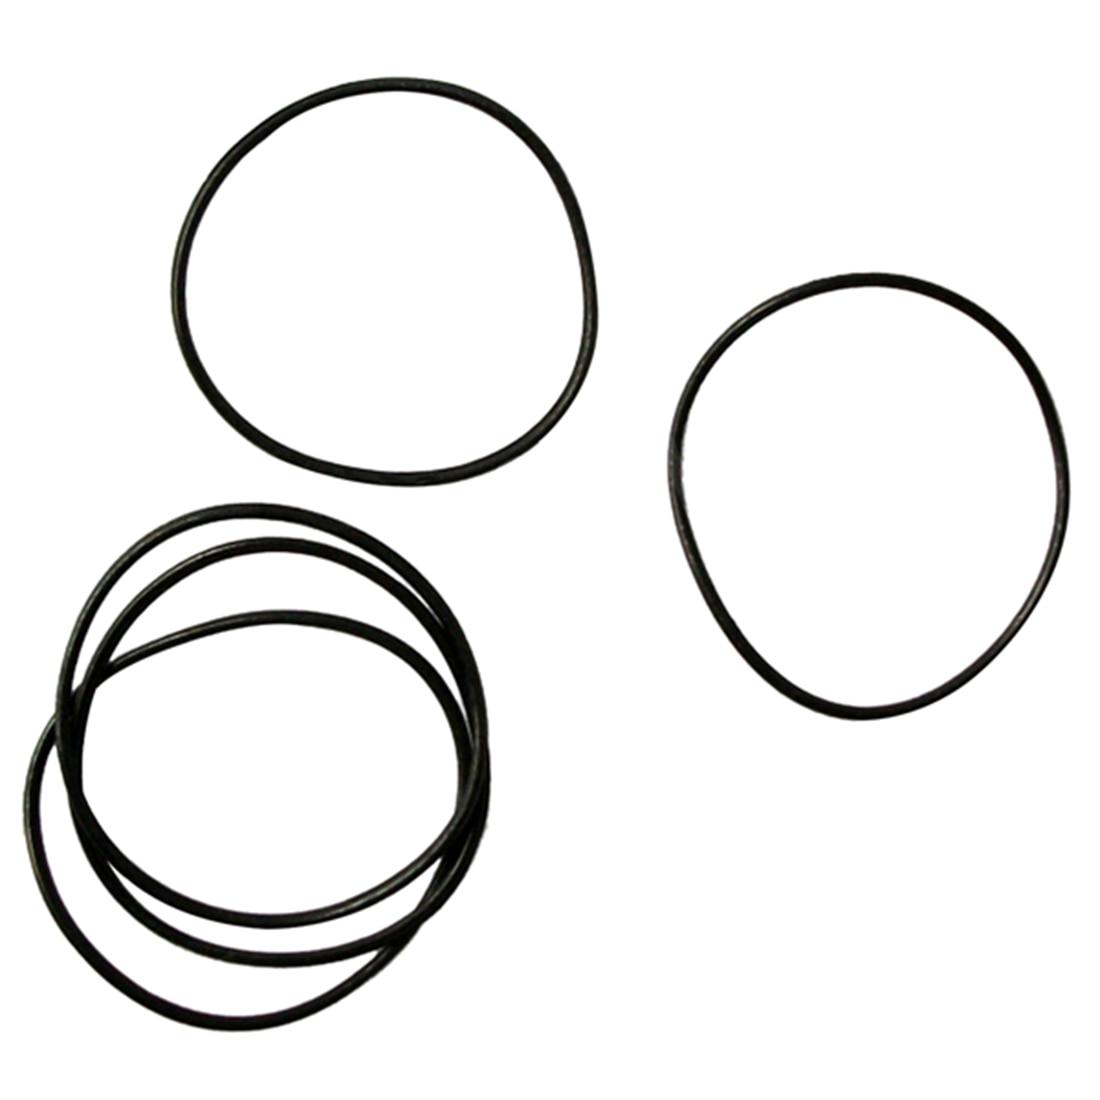 New Elastic Shoe Lace No Tie Semi Circular Shoelaces For